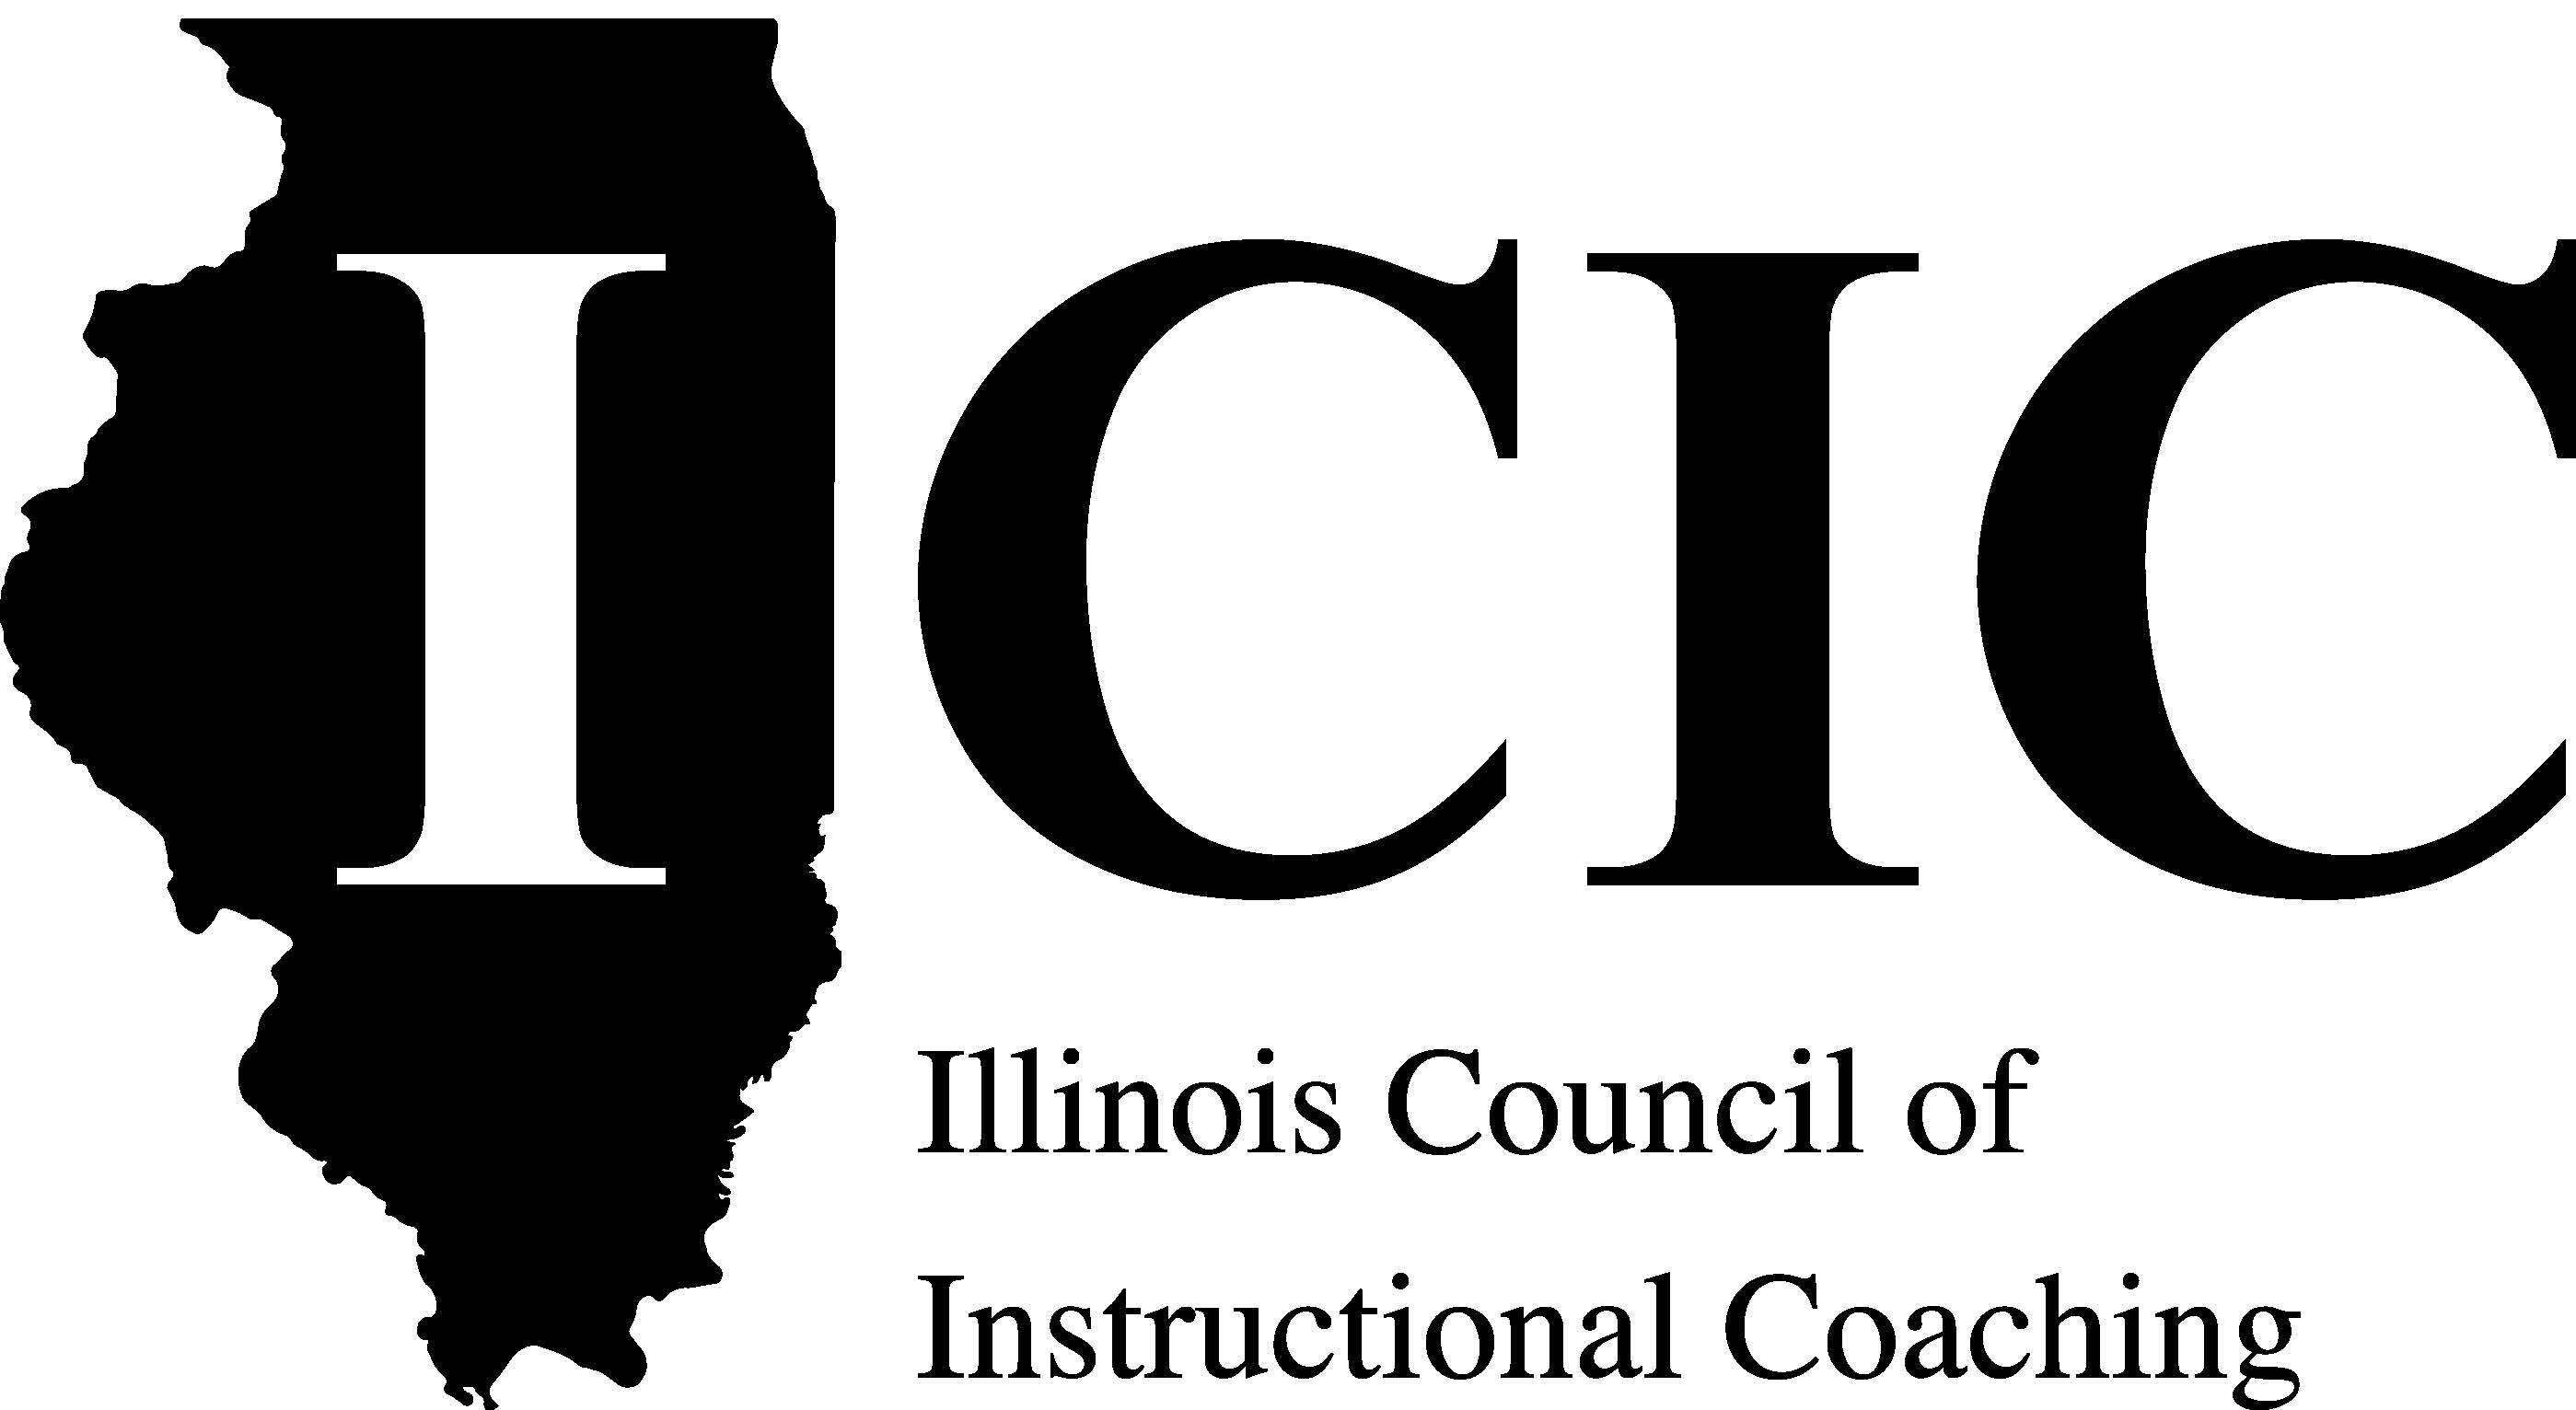 Copy of ICIC final